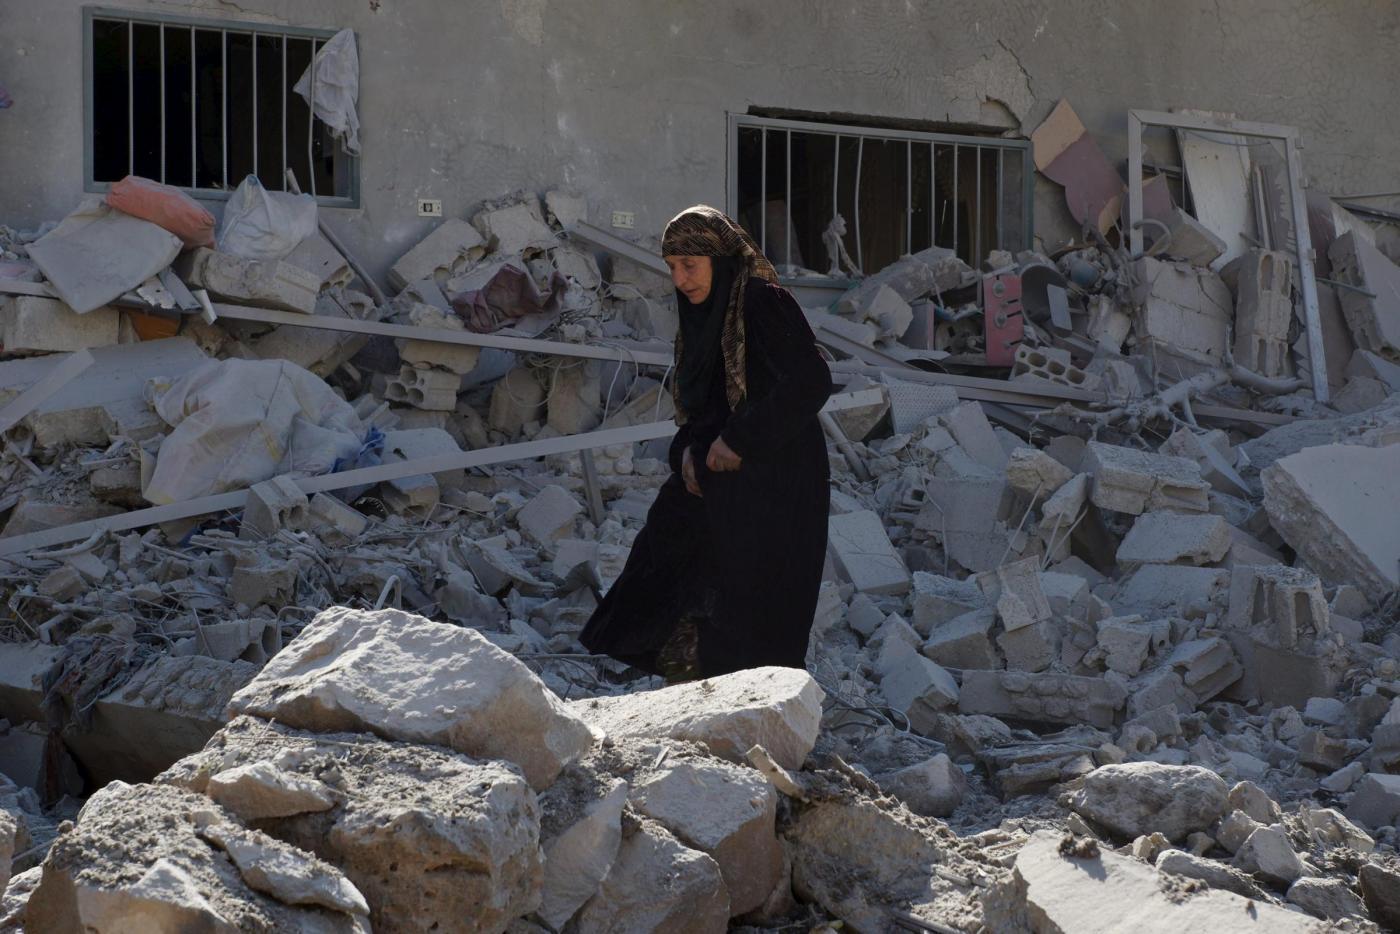 Siria, continuano i raid aerei su civili a Deraa